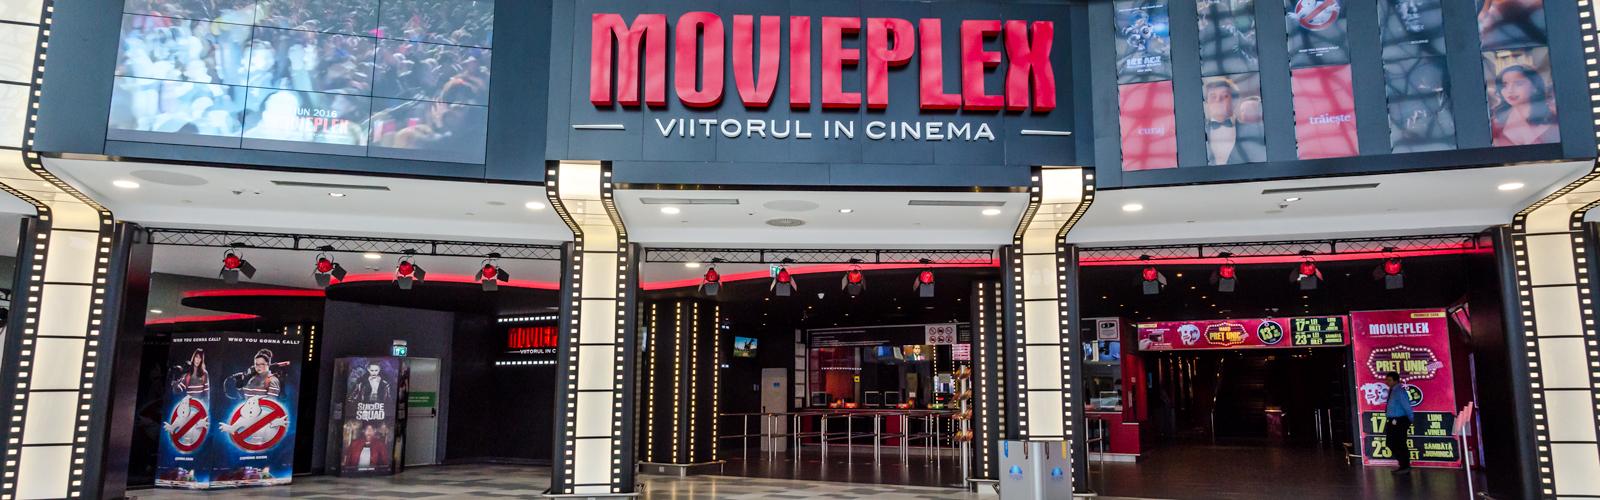 Movieplex Cinema 3d Si 2d In Mall Plaza Romania Cele Mari Tari Filme